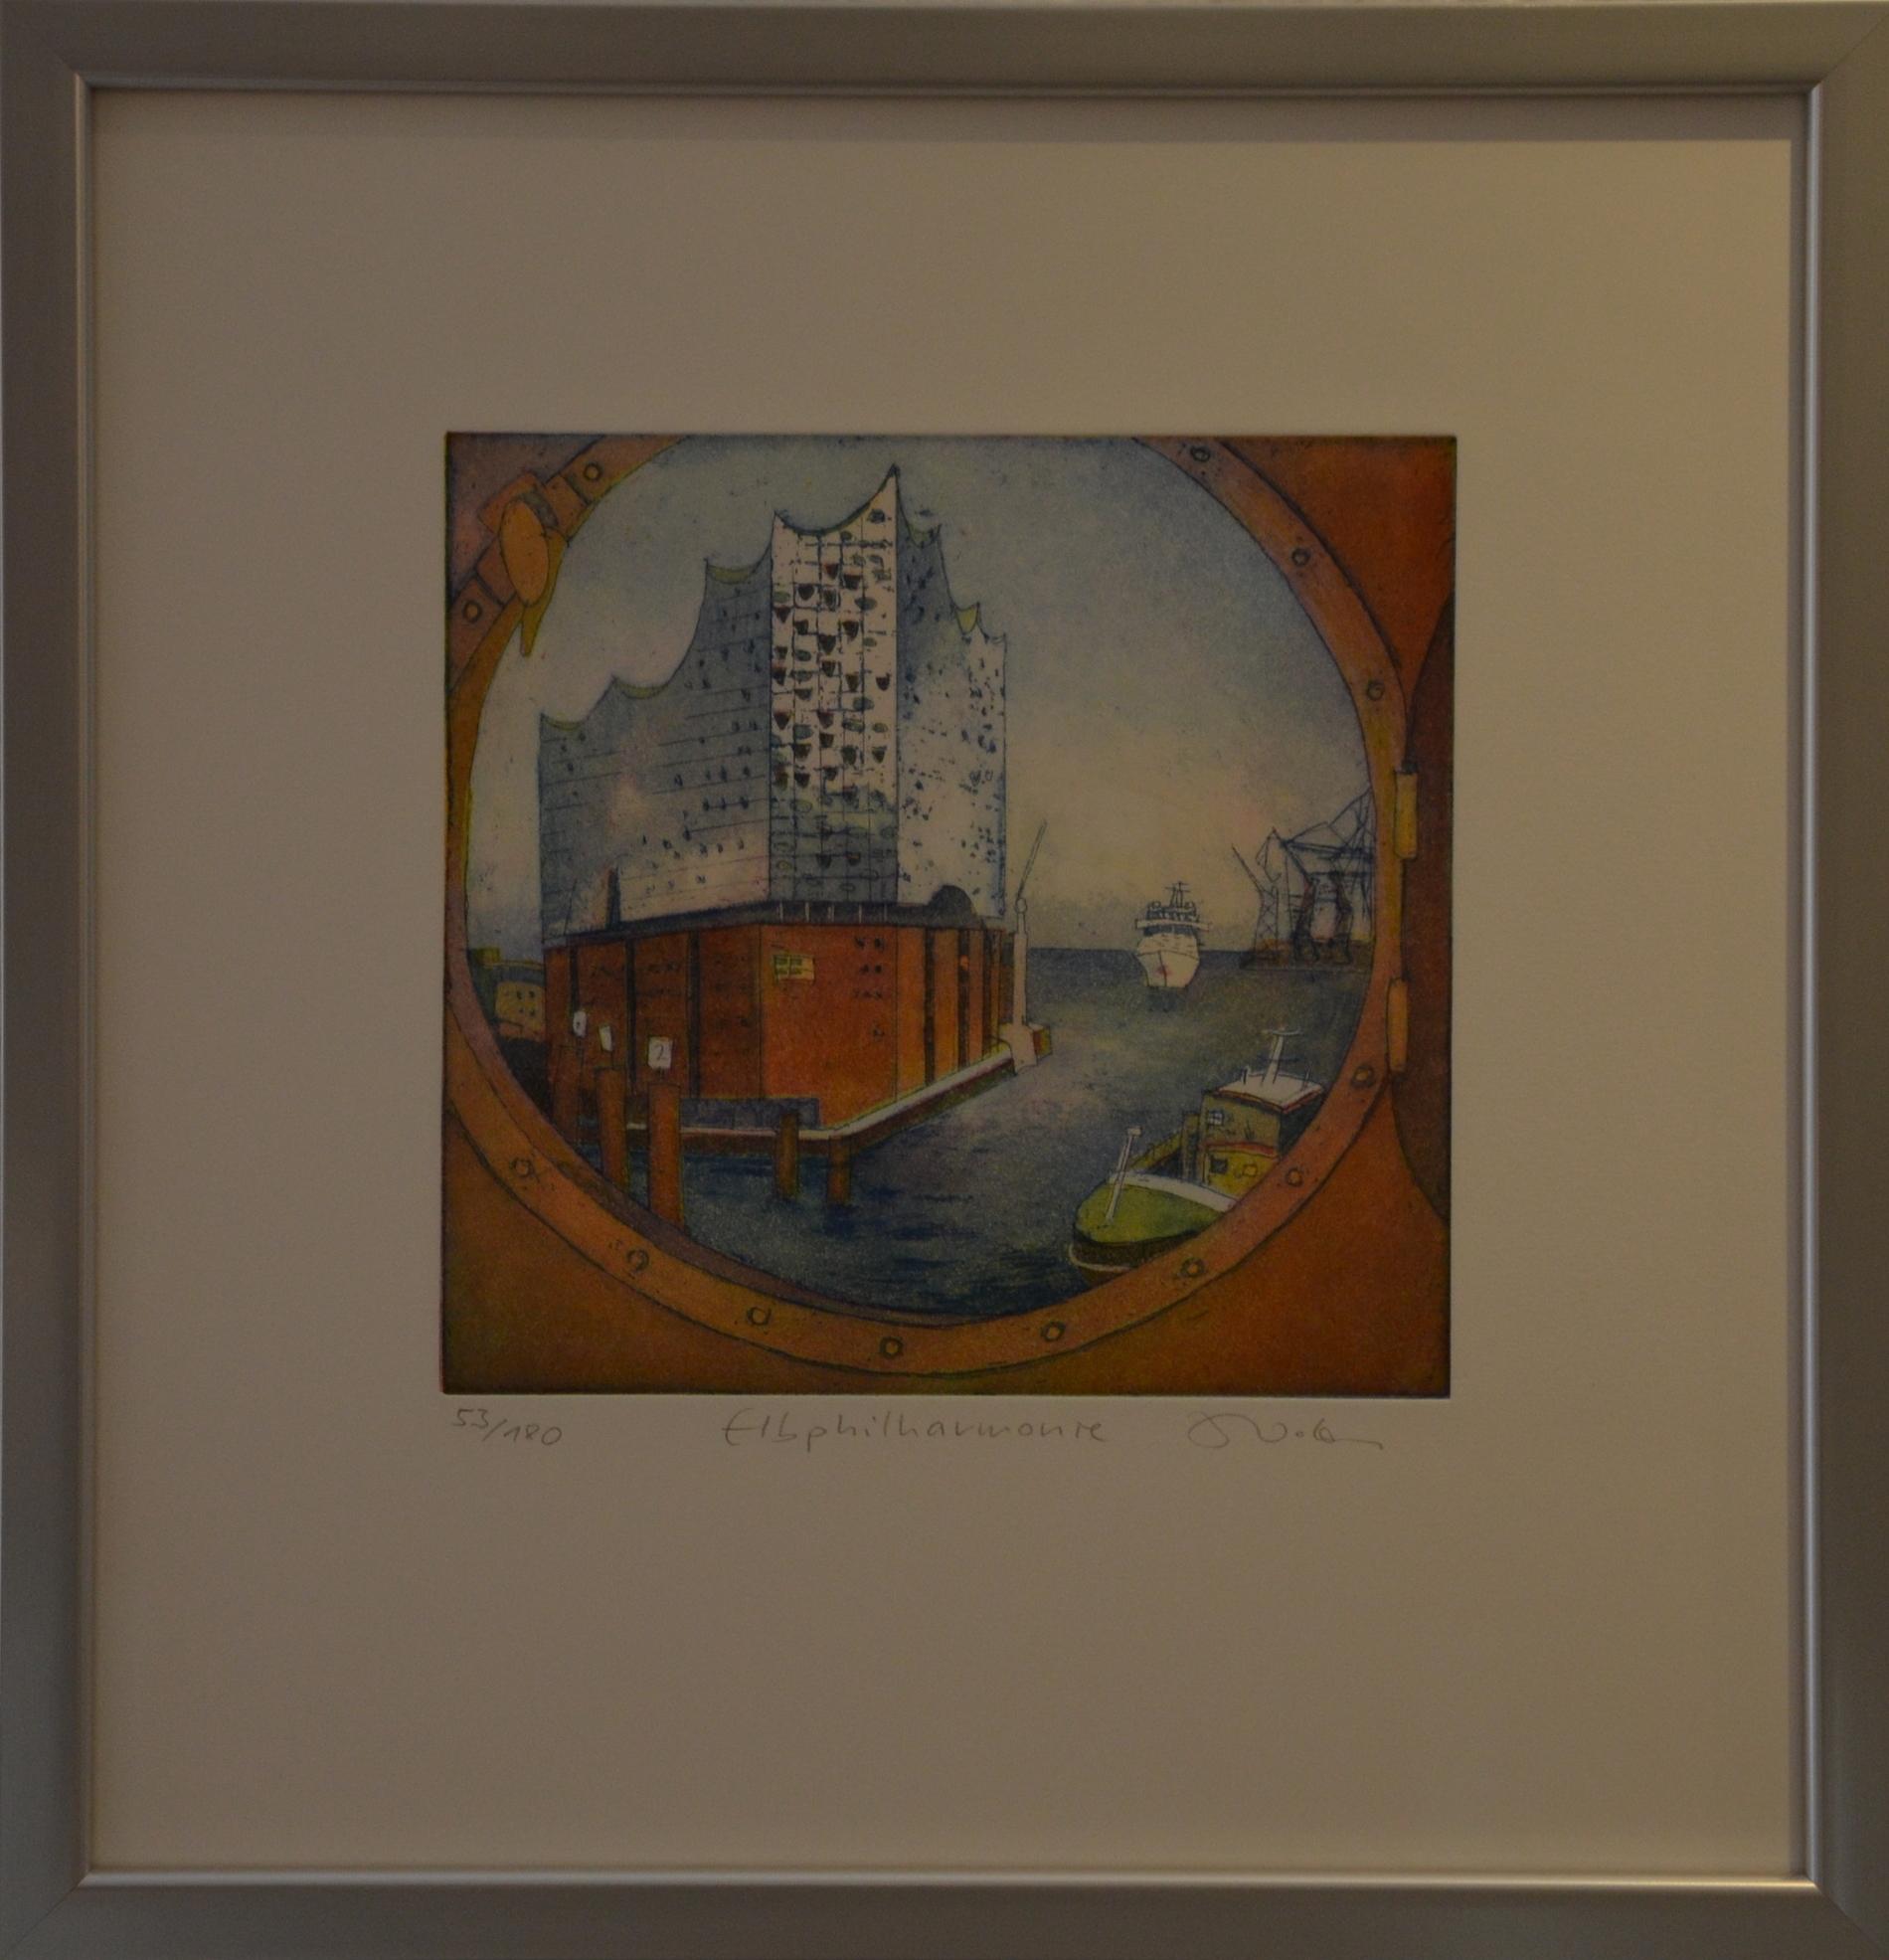 Elbphilharmonie, gerahmt